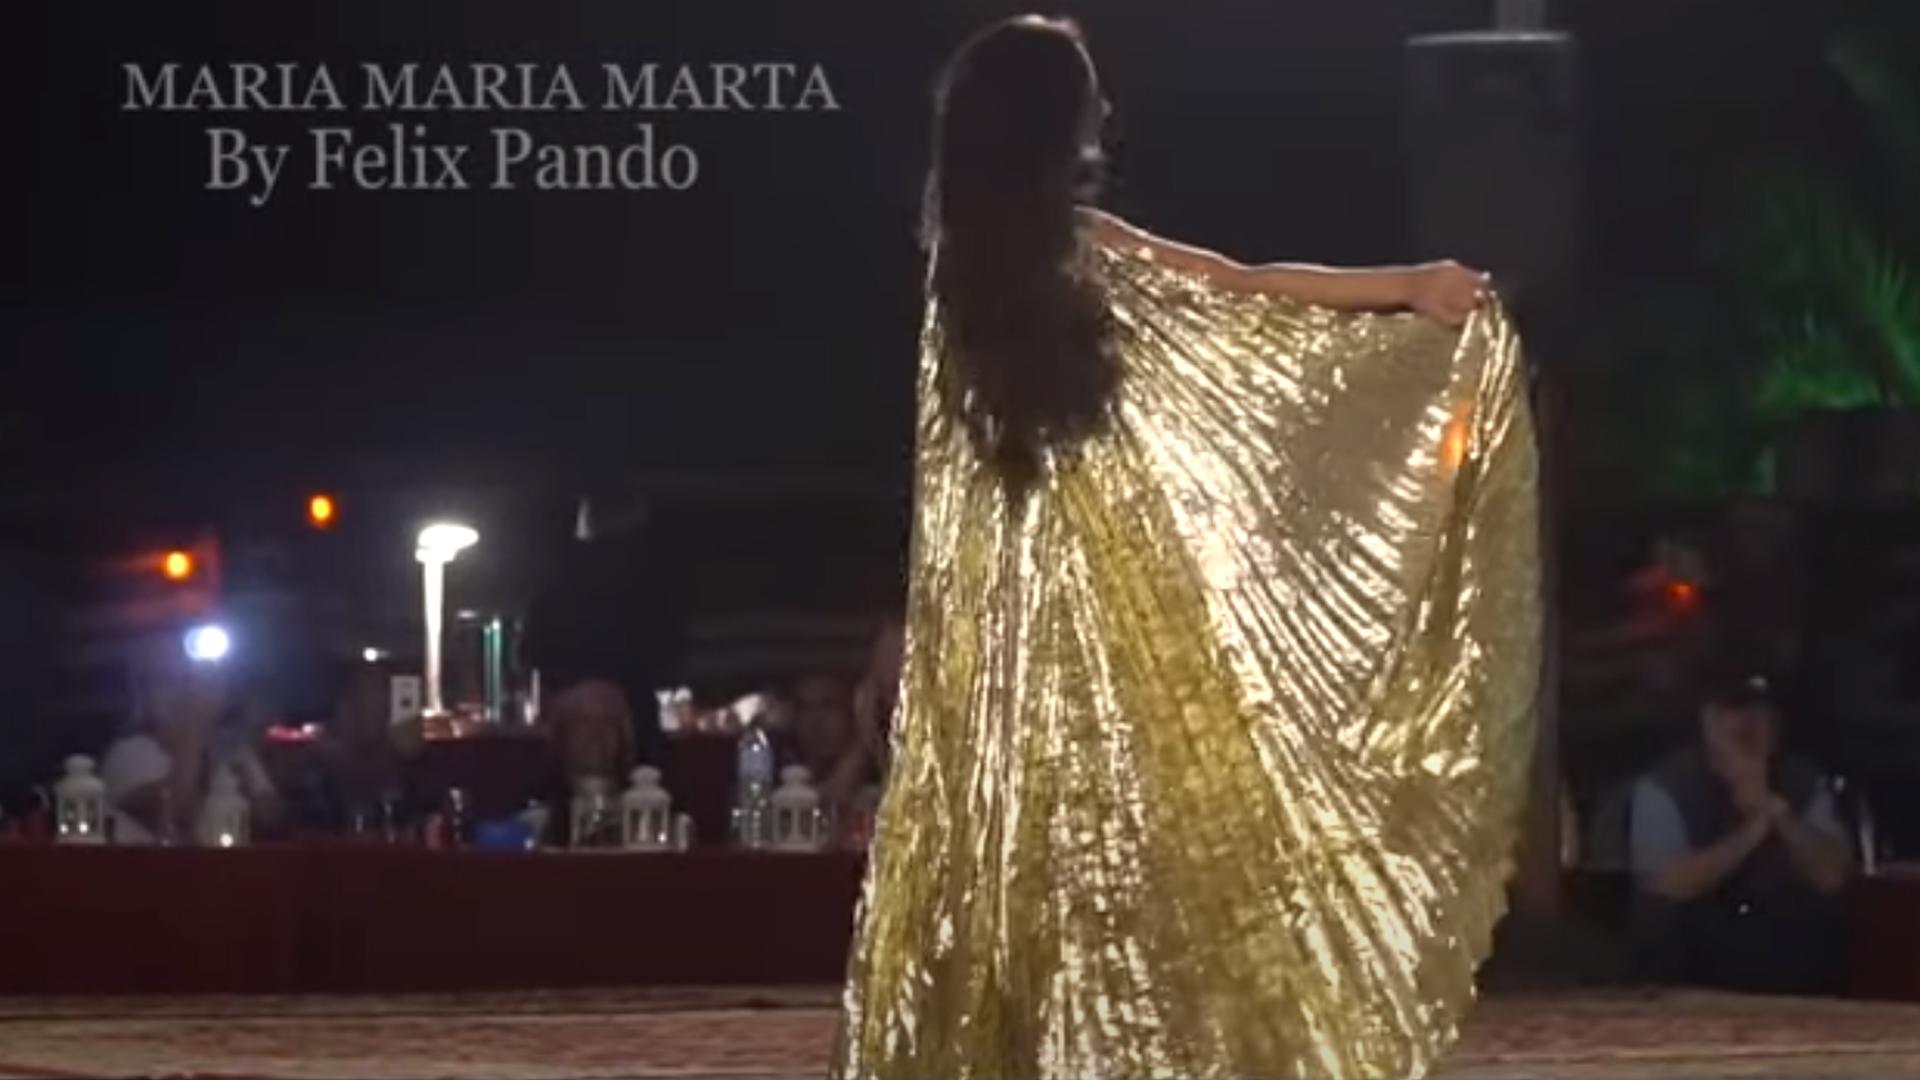 MARIA MARIA MARTA